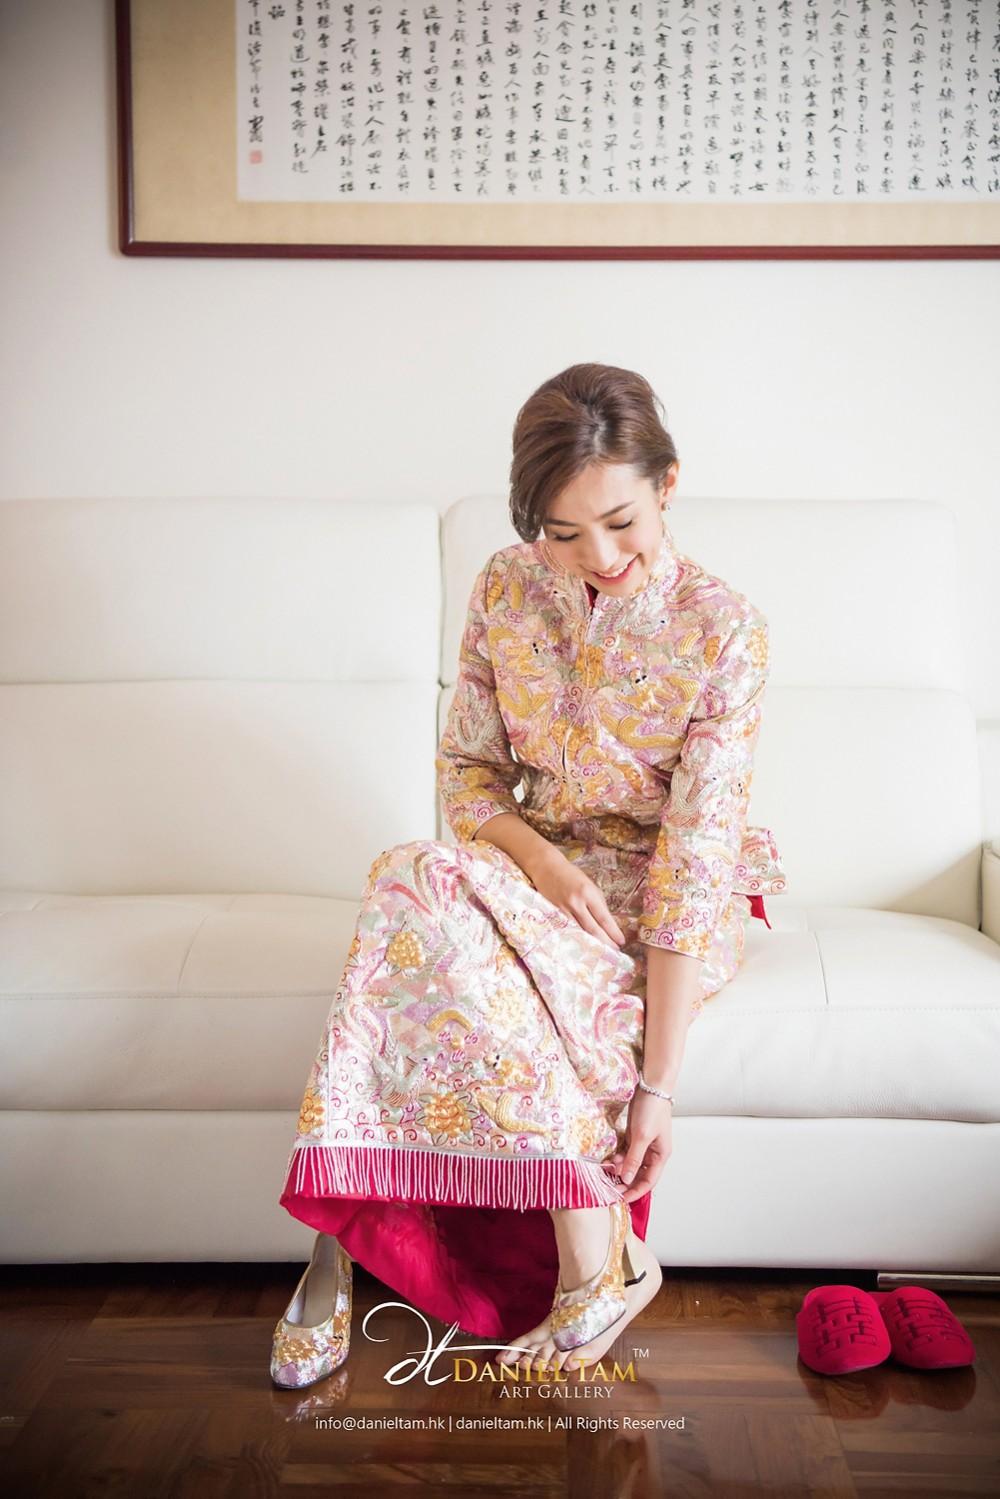 wedding-day-photography-hk-four-seasons-jessica-erik-01wedding-day-photography-hk-four-seasons-jessica-erik-04